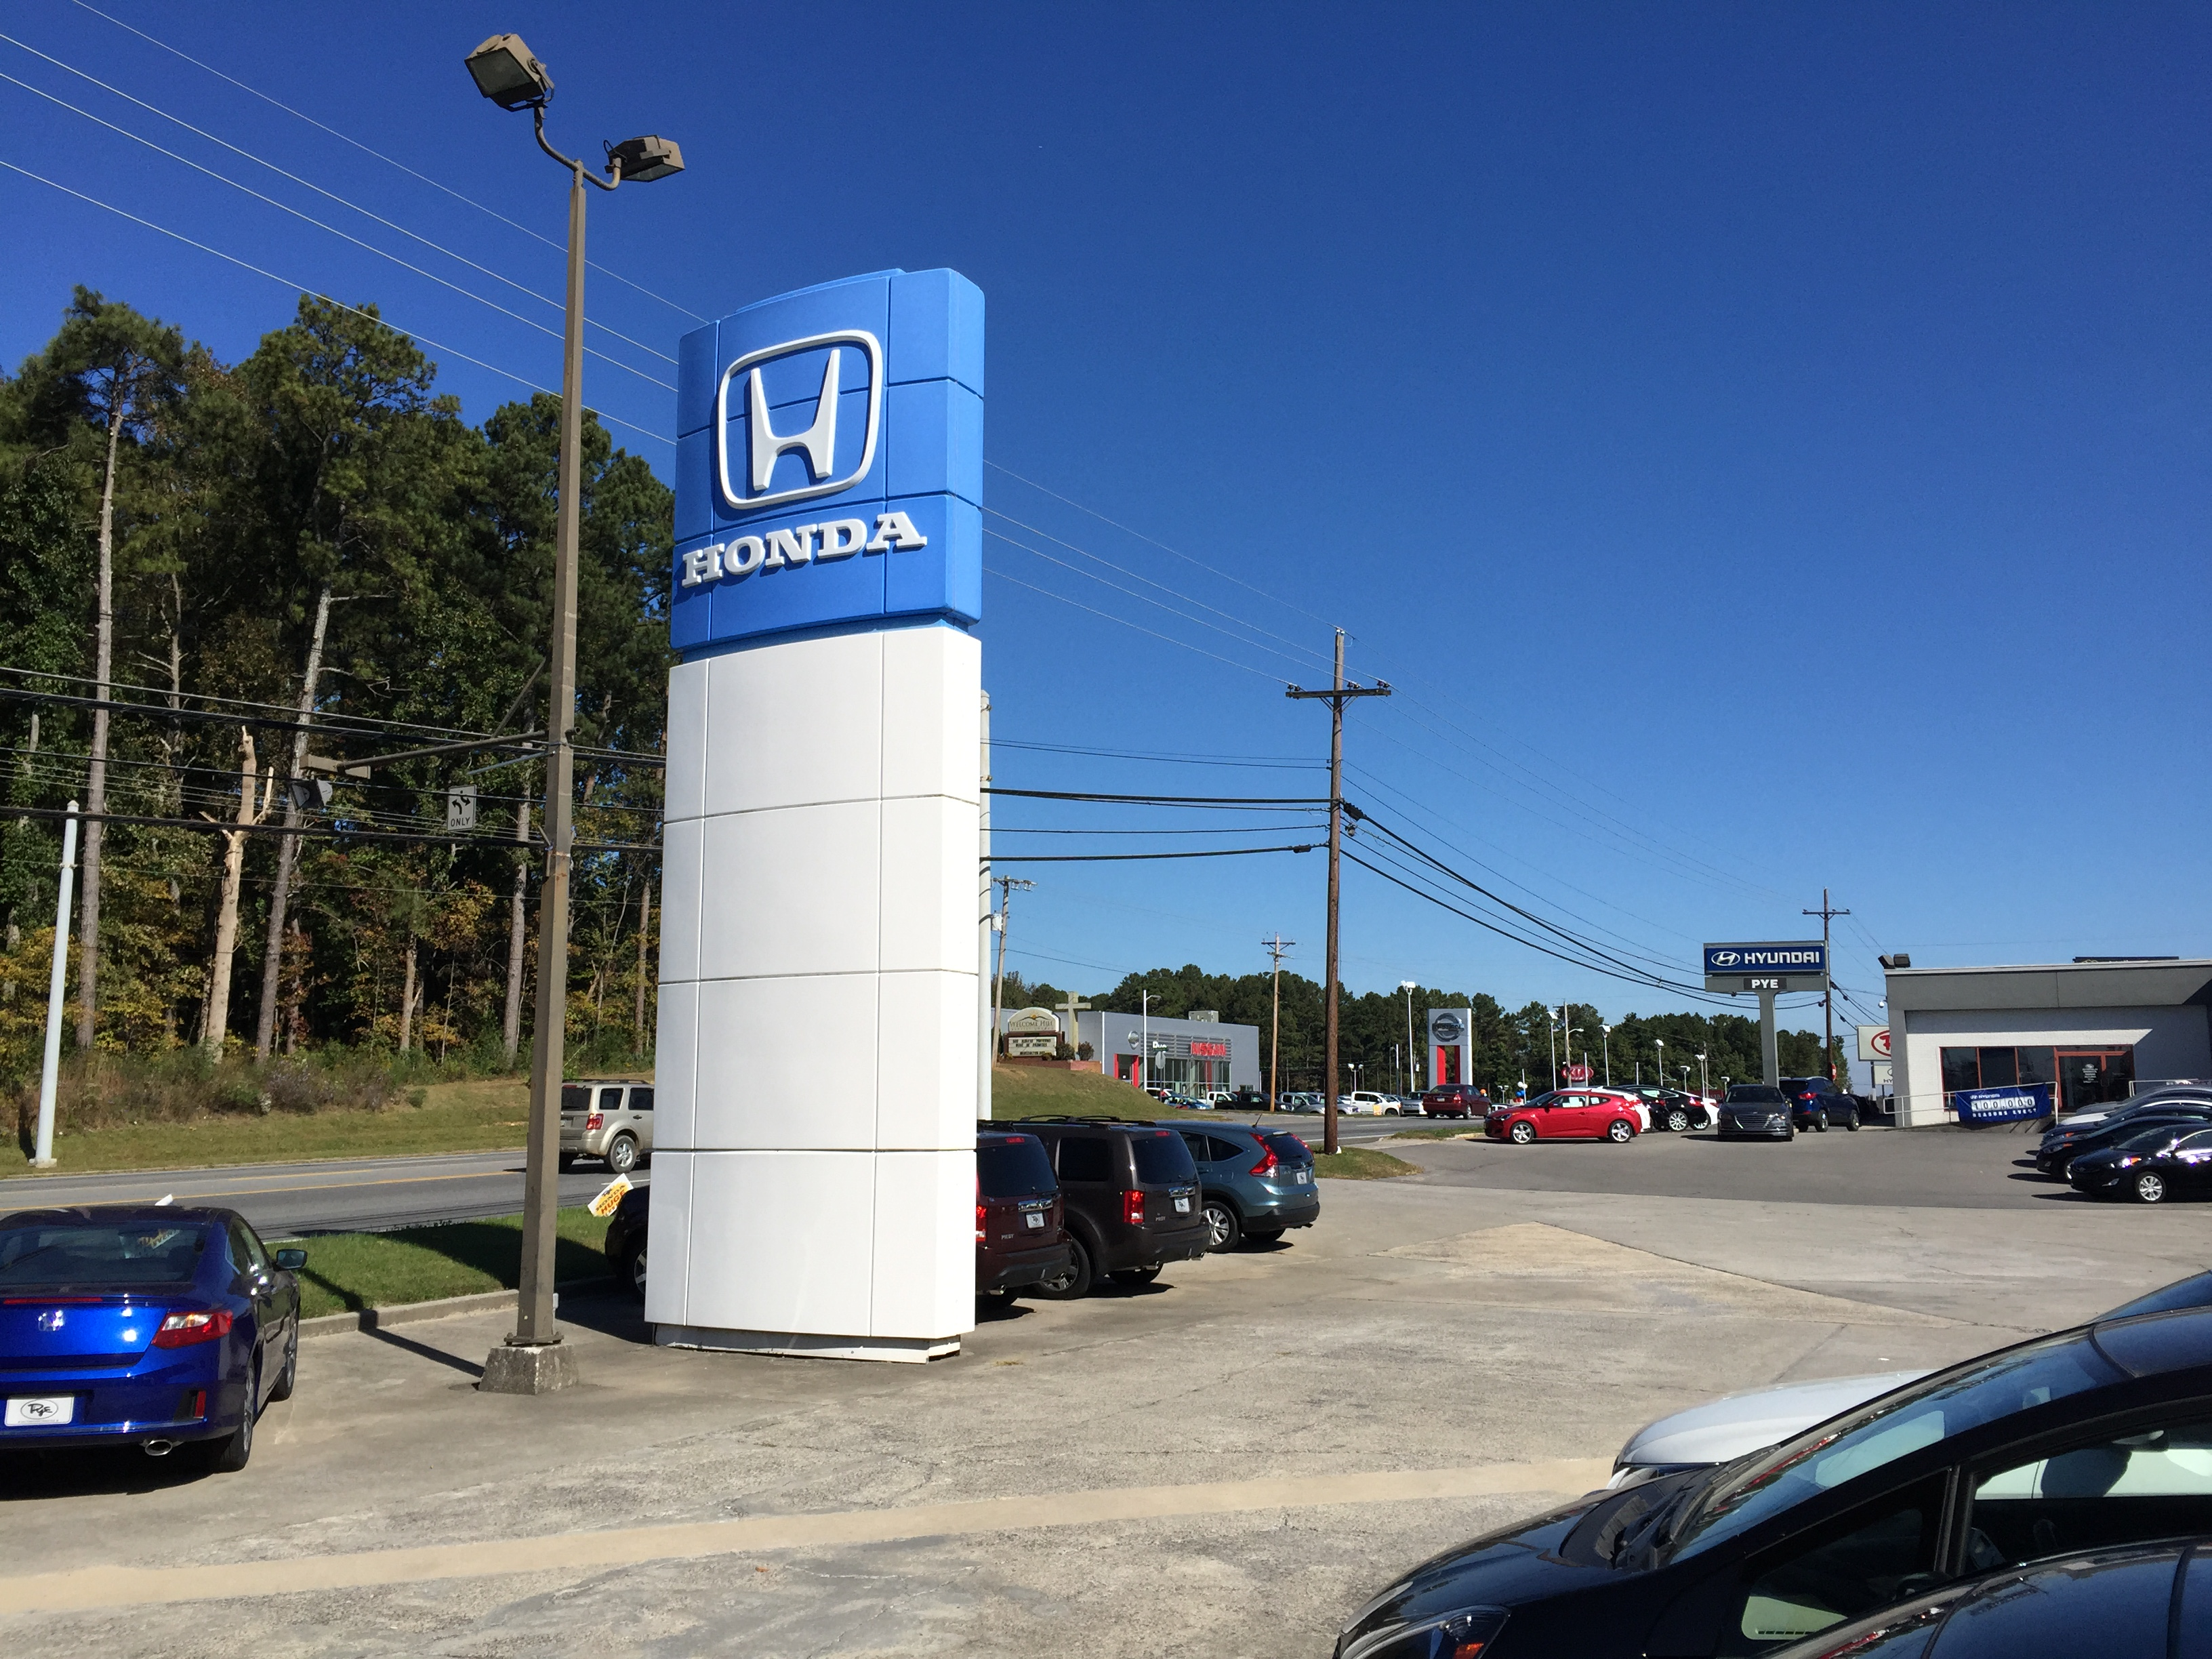 Pye Nissan in Dalton GA